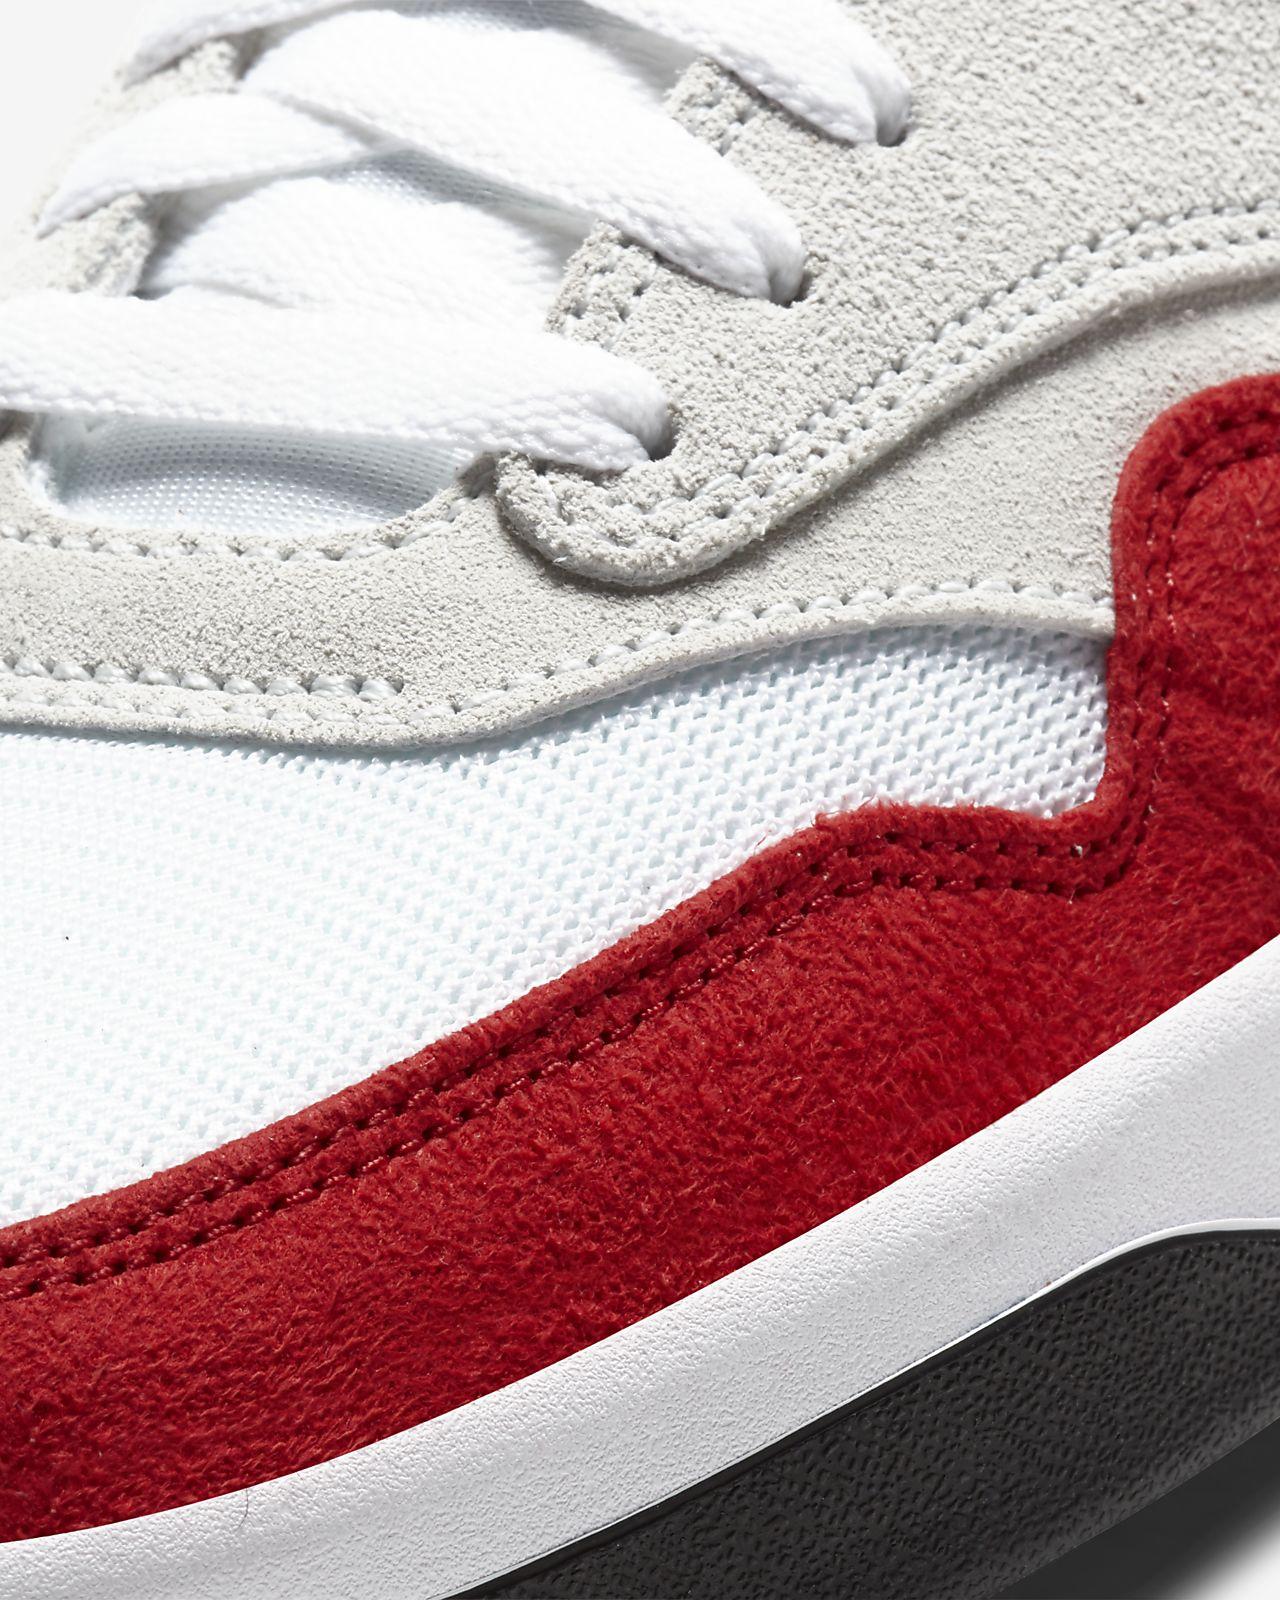 Nike SB GTS Return Air Max 1 CK3464 600 Release Date SBD